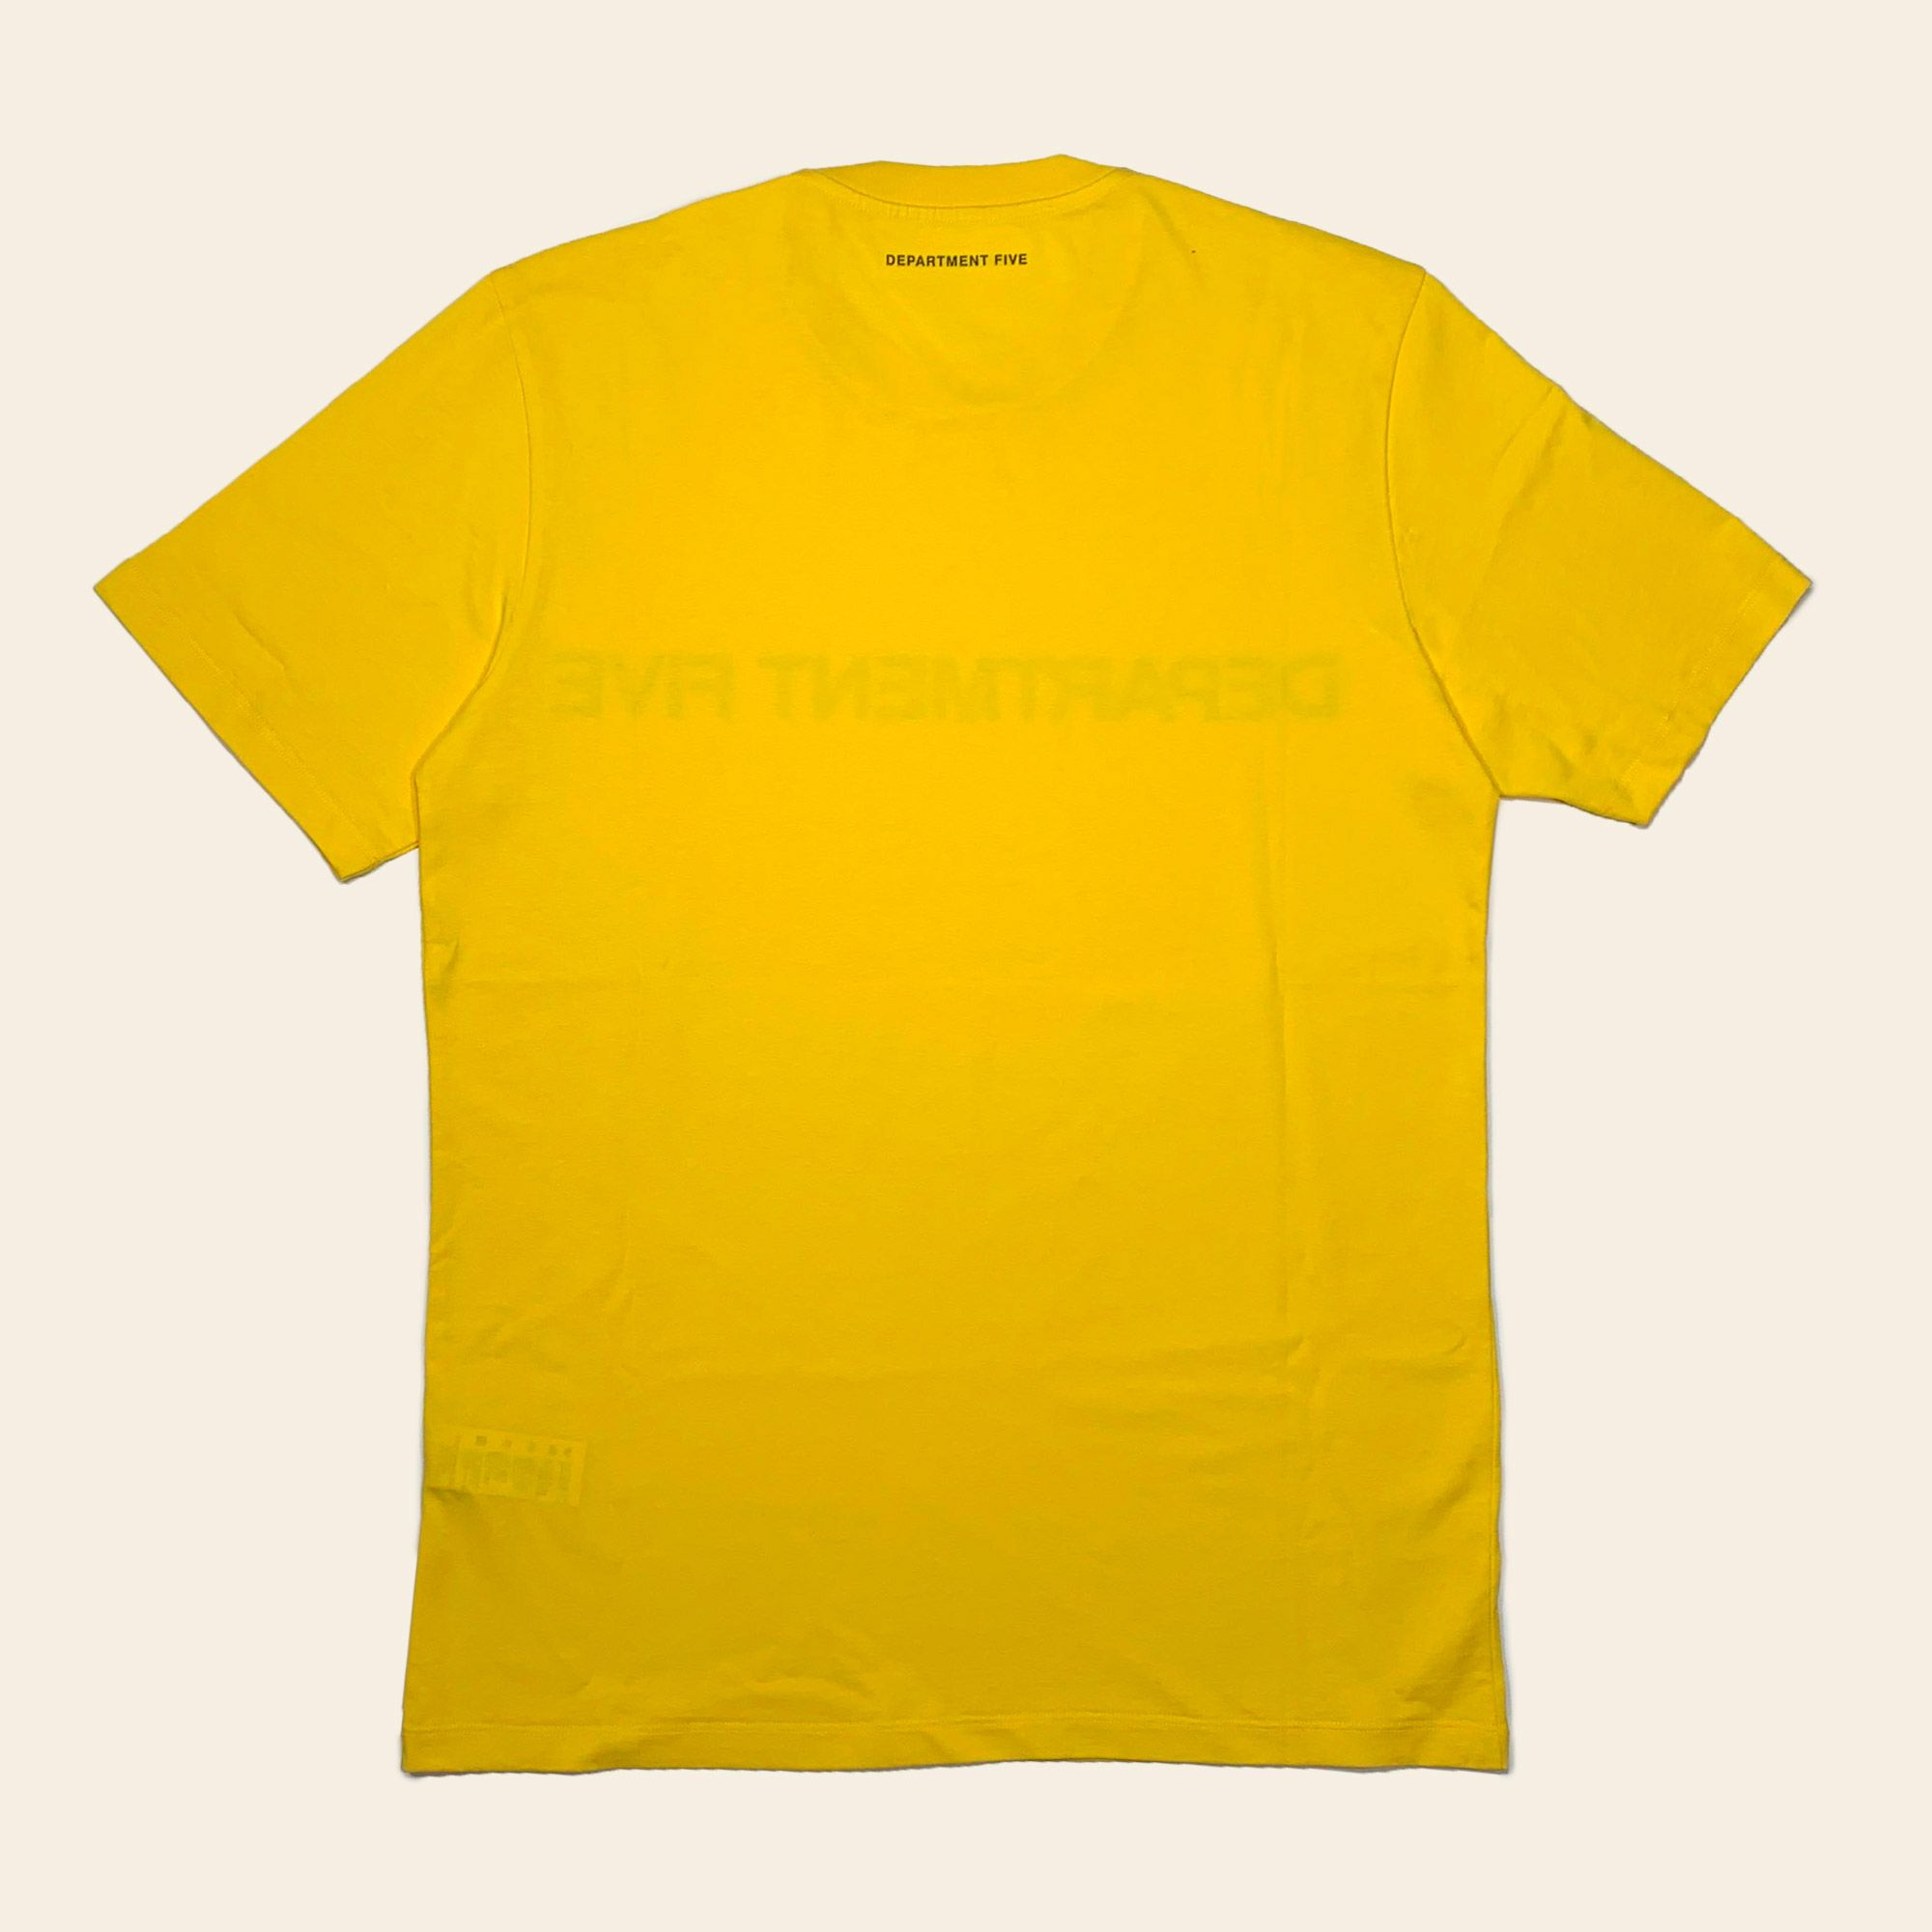 department 5 gars l man t-shirt U00TL1